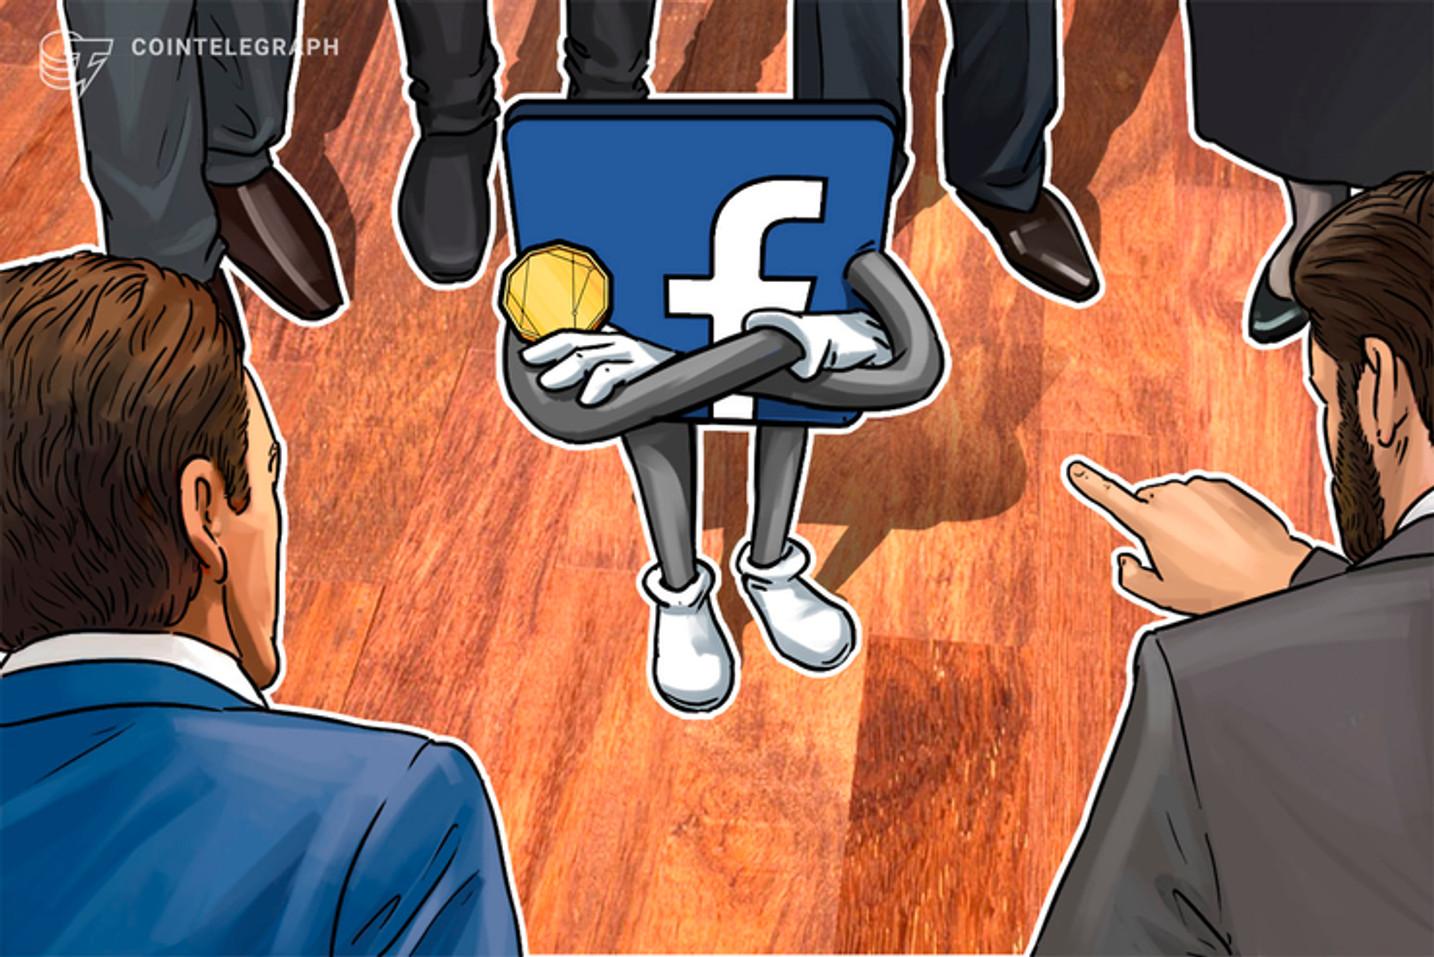 Facebook Libra: Experten warnen bei Bundestag-Fachgespräch vor geplanter Stablecoin